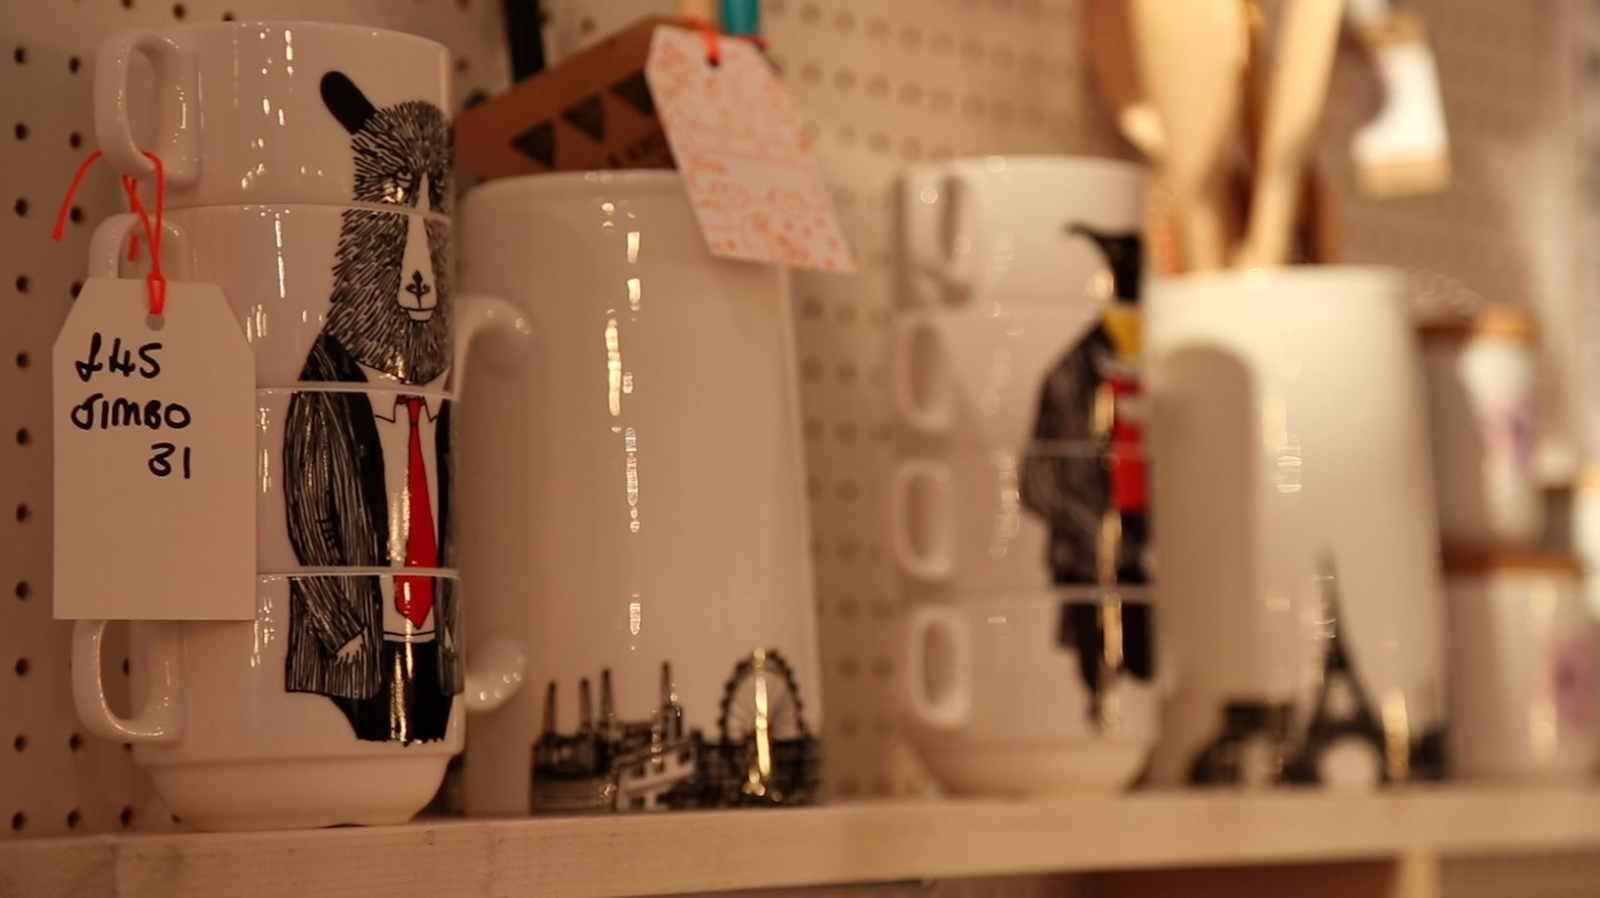 Etsy and the return of handmade goods